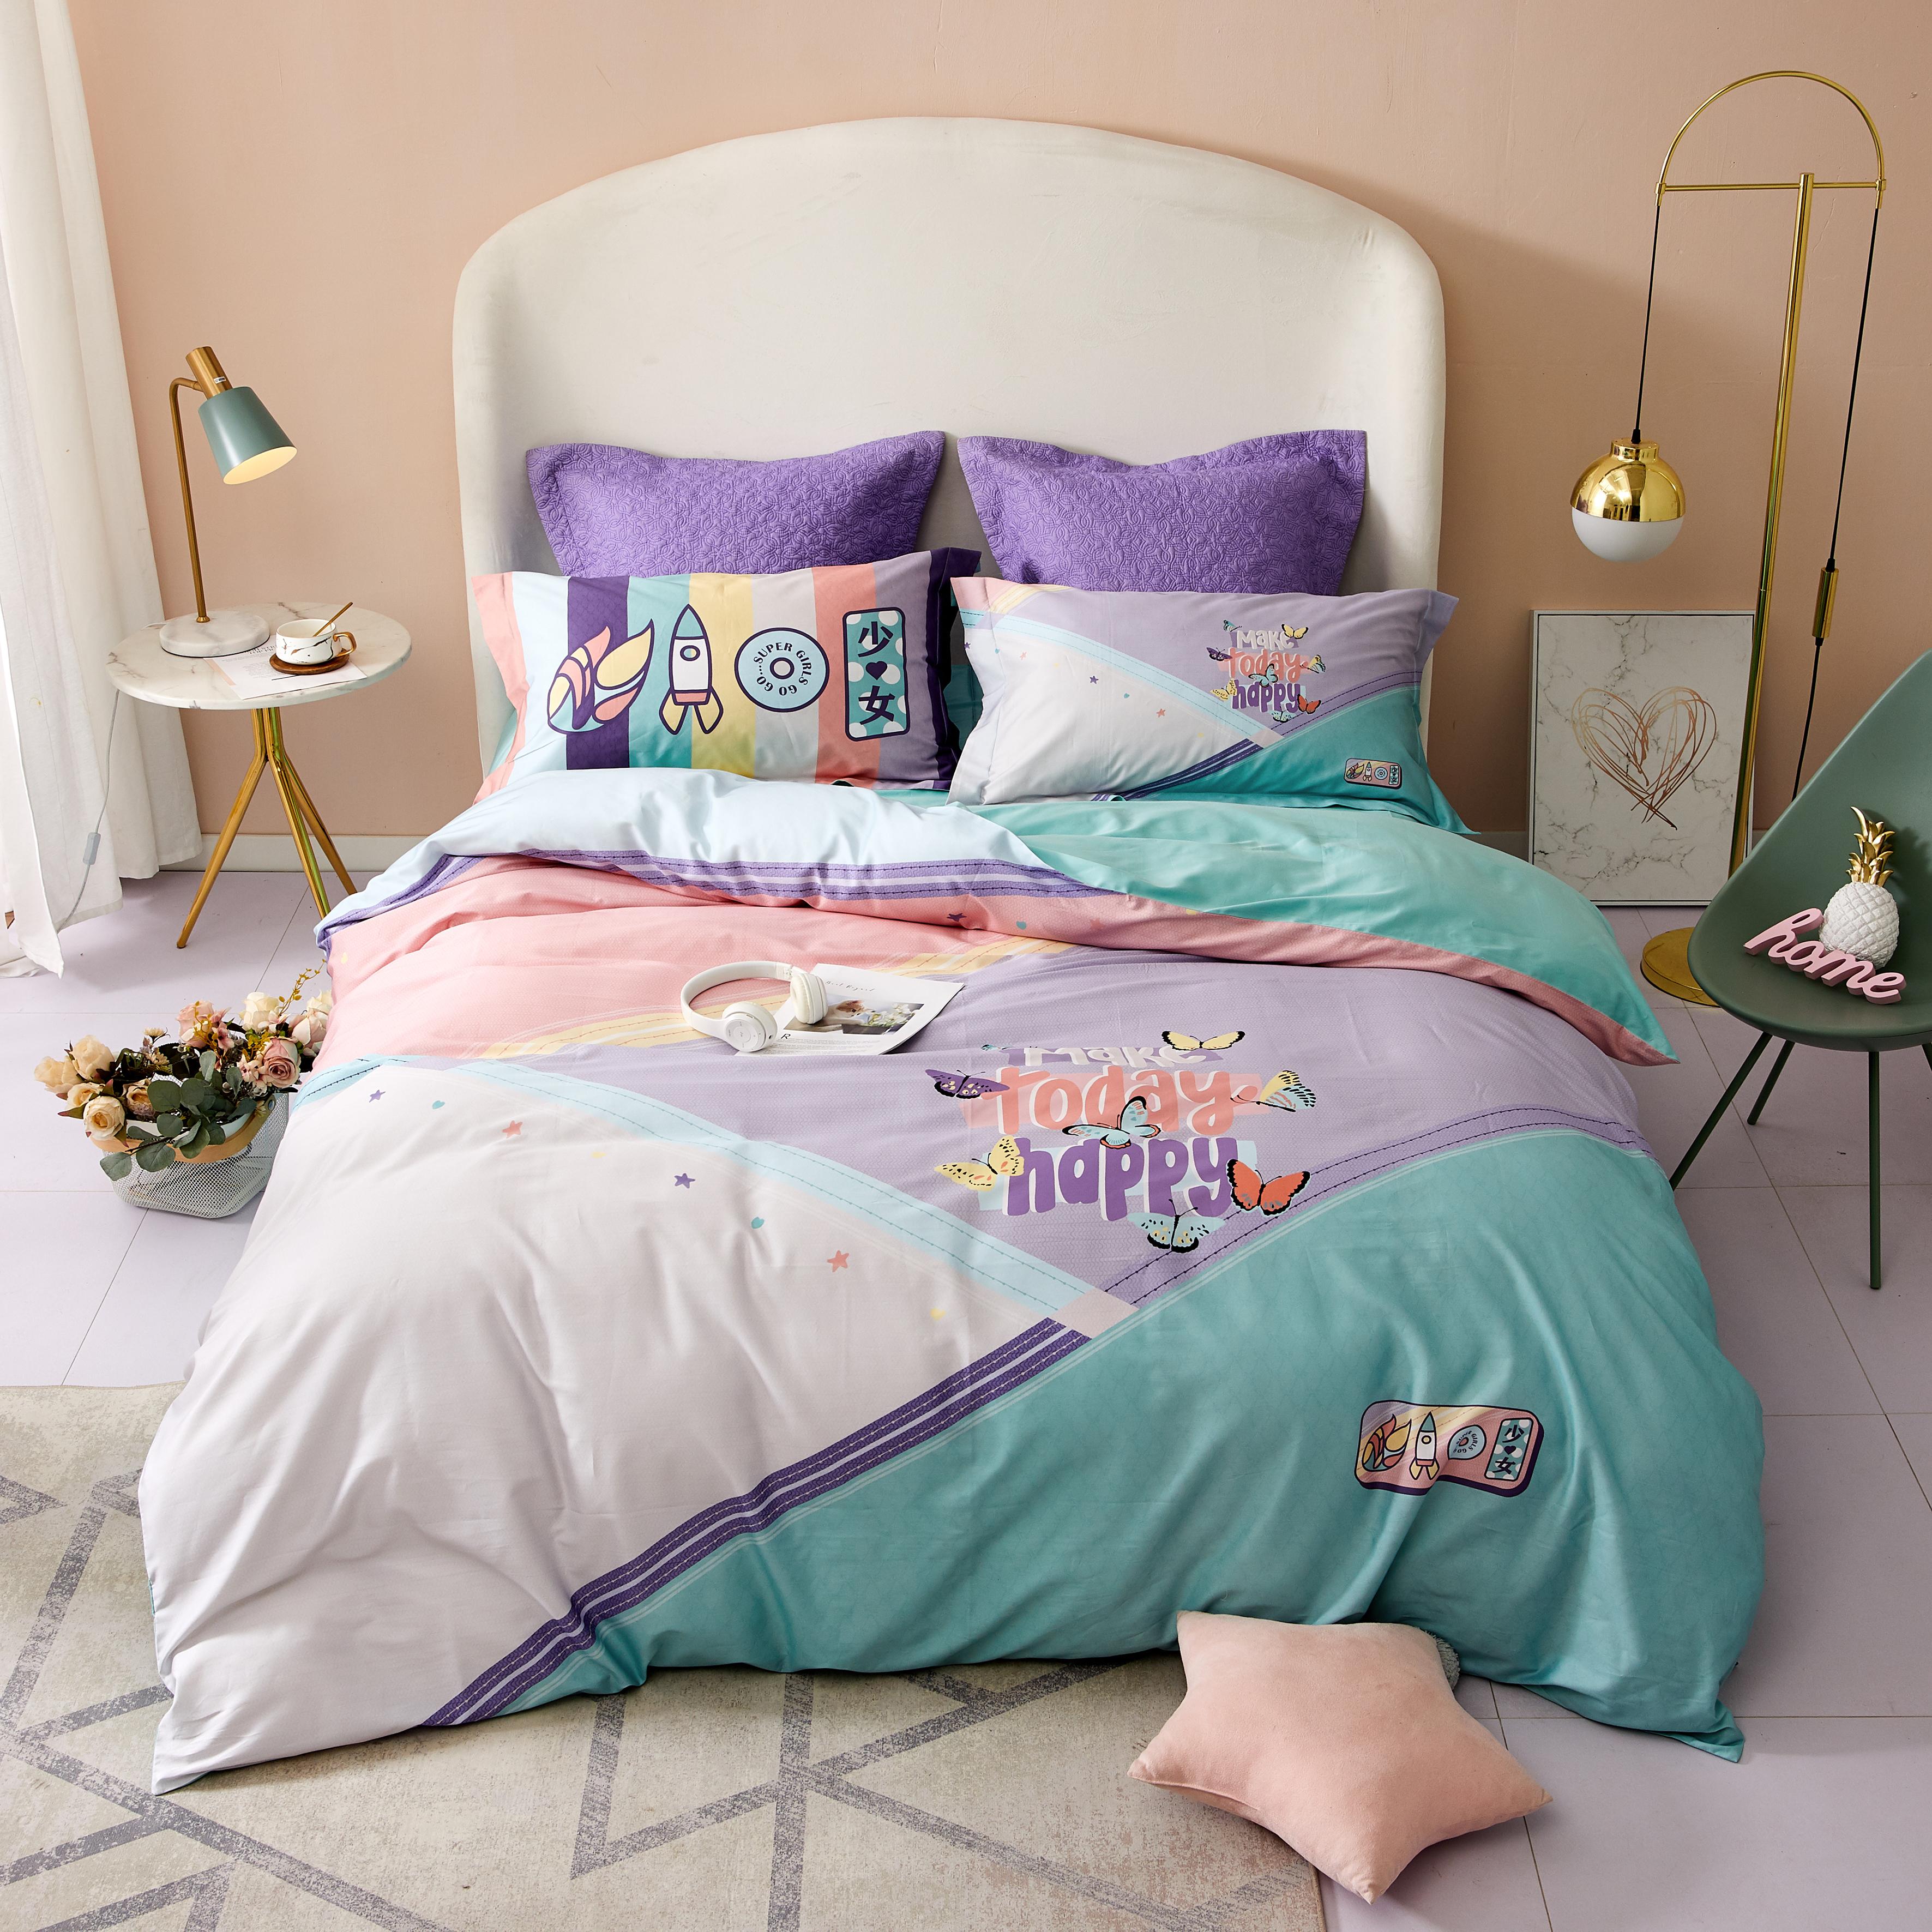 60S長絨棉數碼床蓋四件套-普羅旺斯